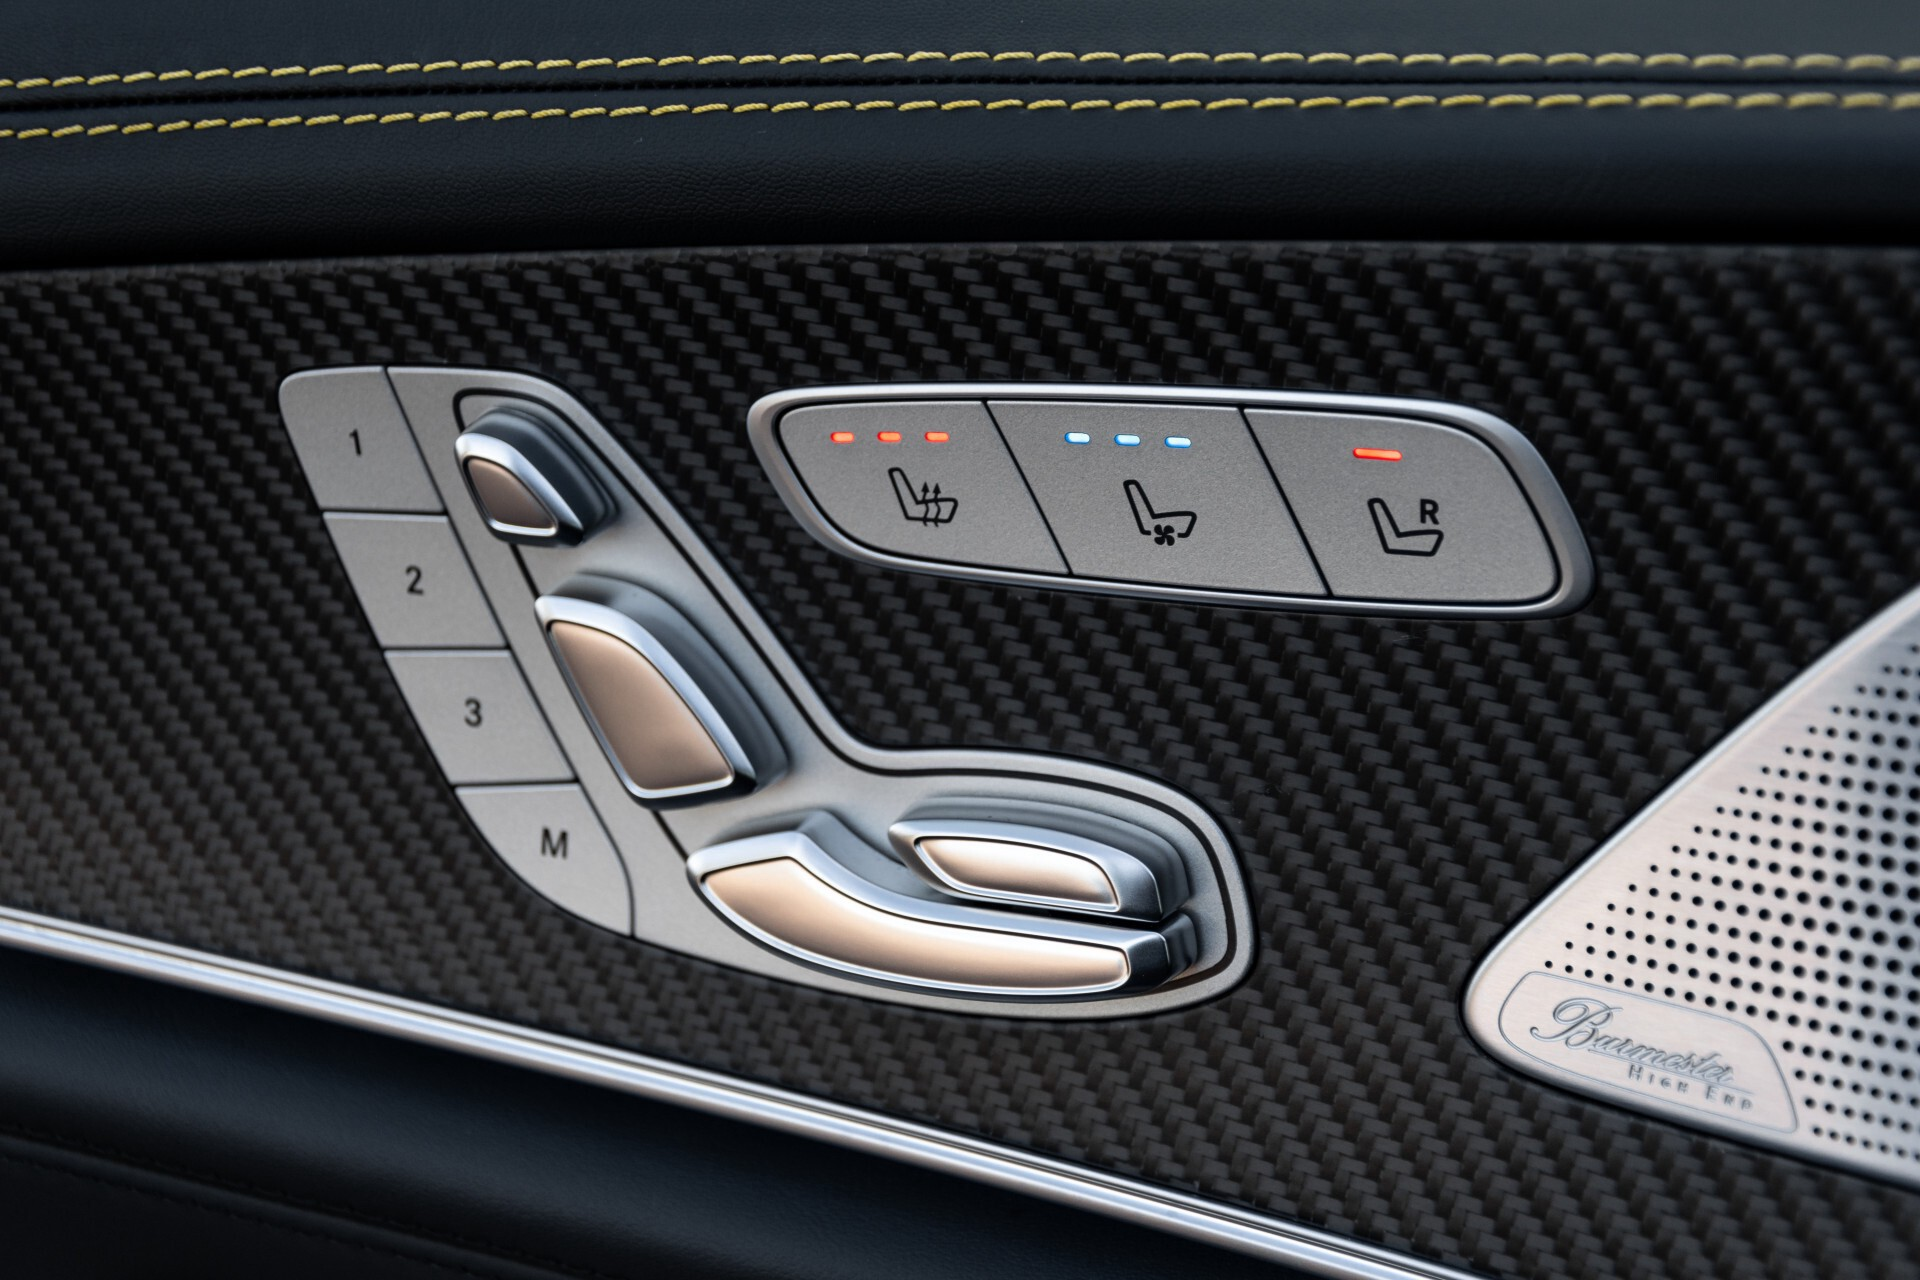 Mercedes-Benz AMG GT 4-Door Coupe 63 S 4MATIC+ Edition 1 Keramisch/Carbon/First Class/Dynamic Plus/Burmester High End 3D Aut9 Foto 20